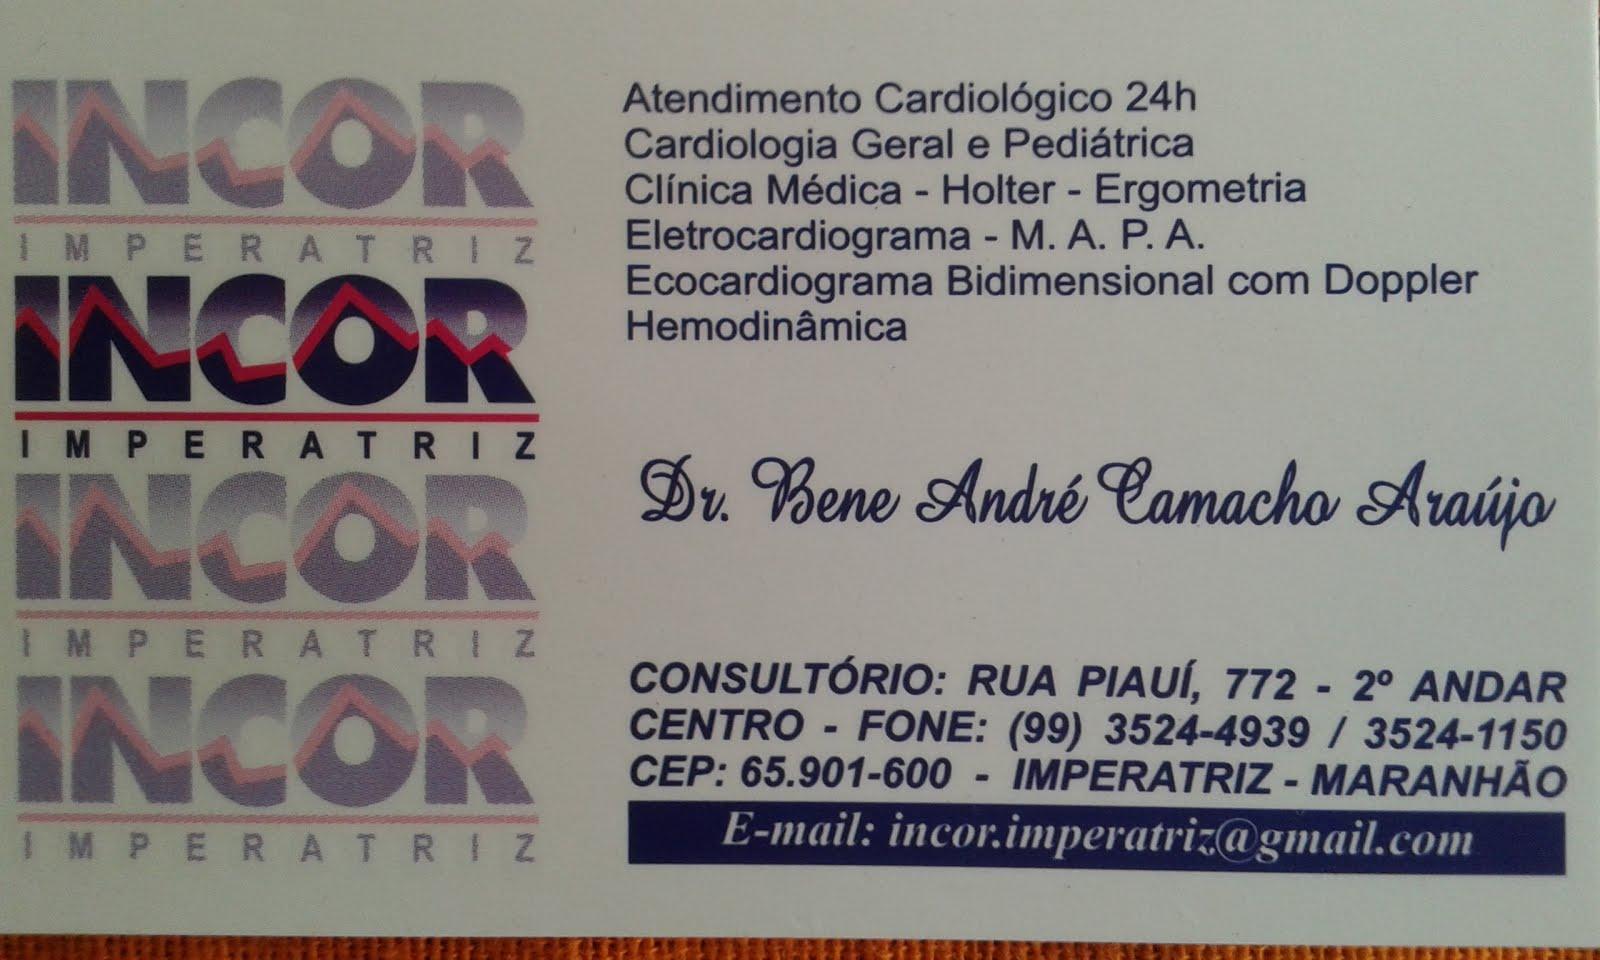 Dr. Bene Camacho